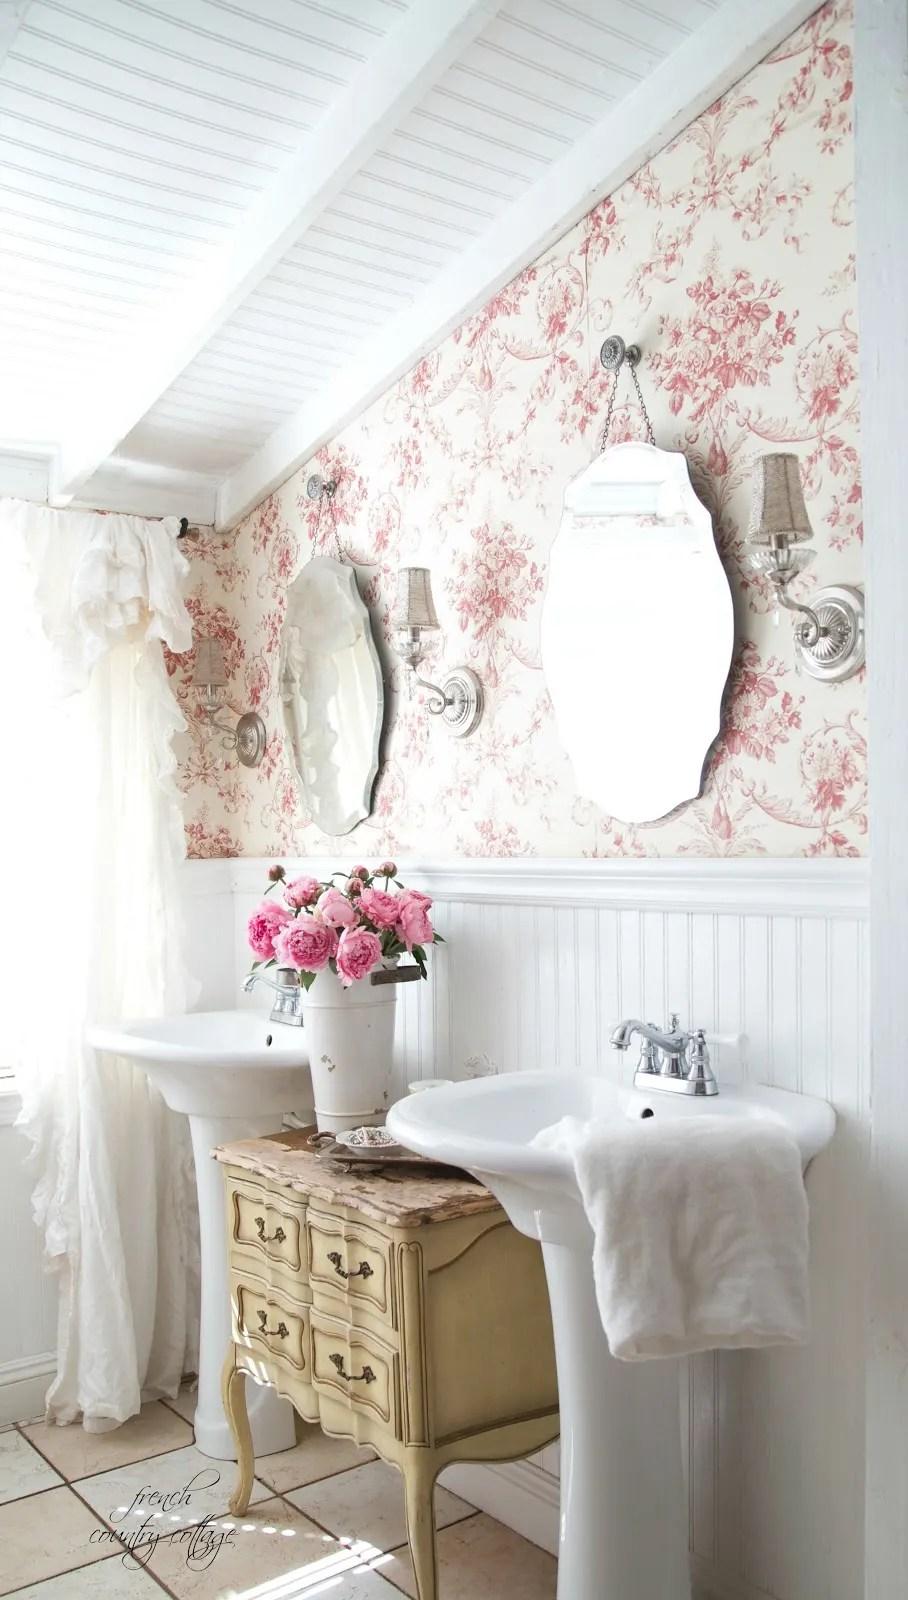 Decorating Ideas: 10 Bathrooms With Beadboard Wainscoting ... on Bathroom Apartment Ideas  id=74221